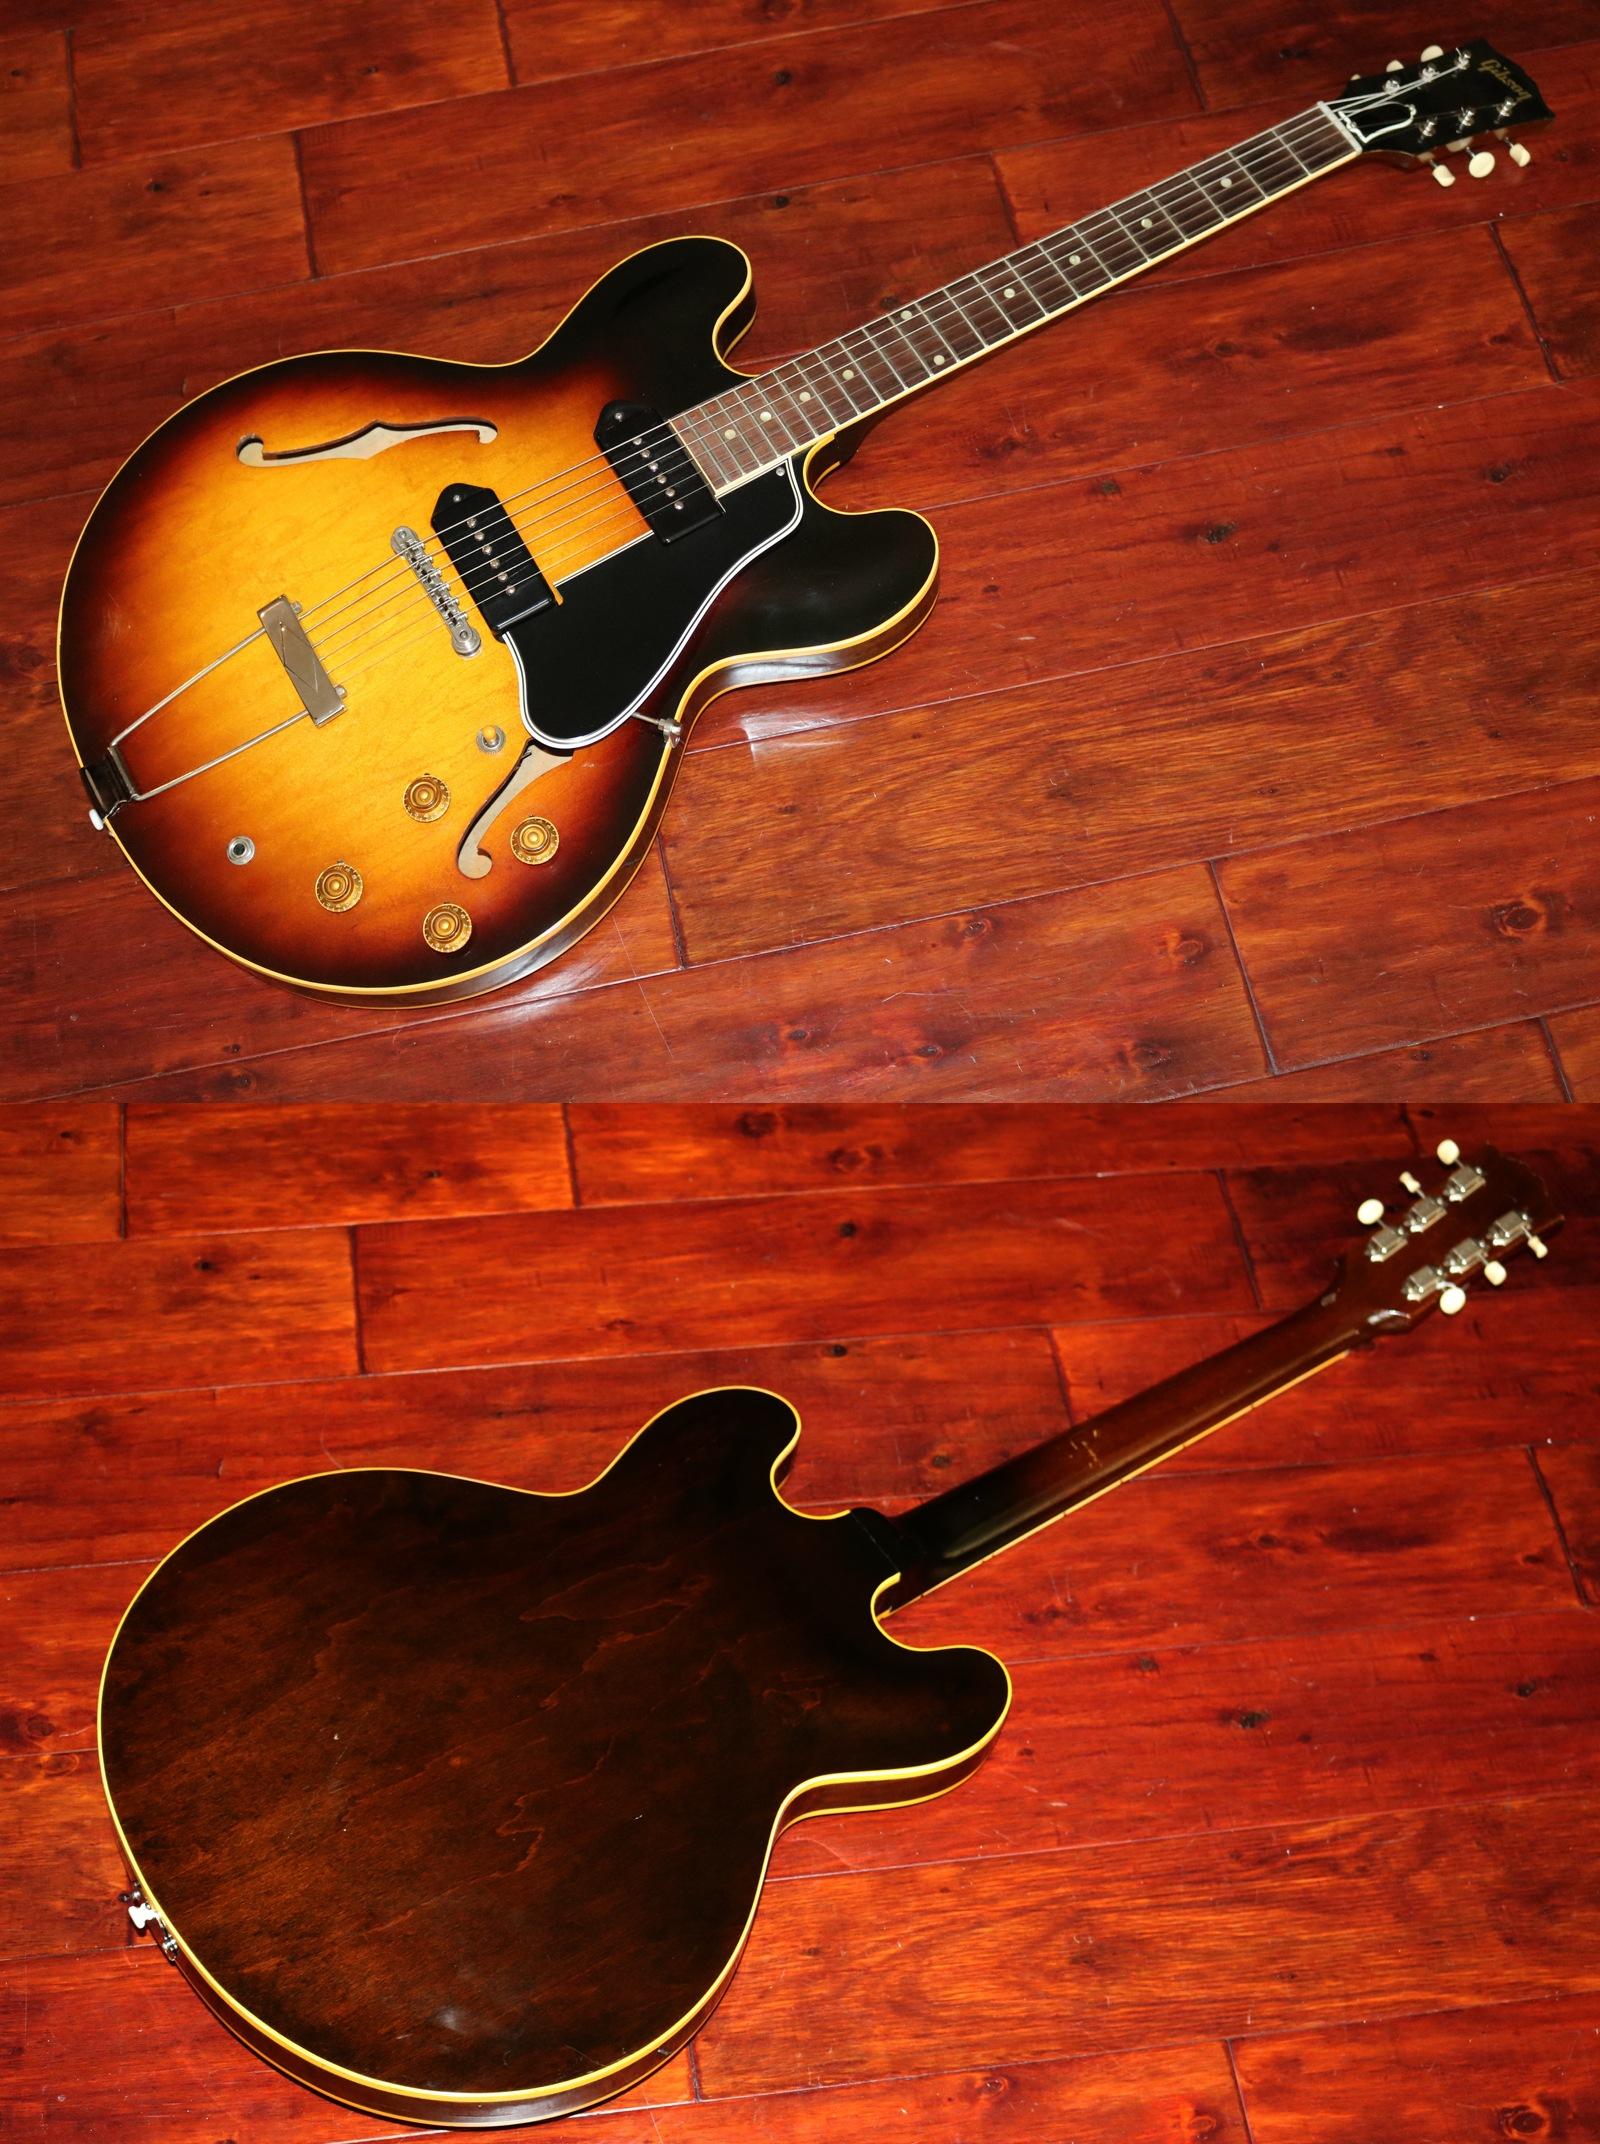 1959 gibson es 330 td garys classic guitars vintage guitars. Black Bedroom Furniture Sets. Home Design Ideas